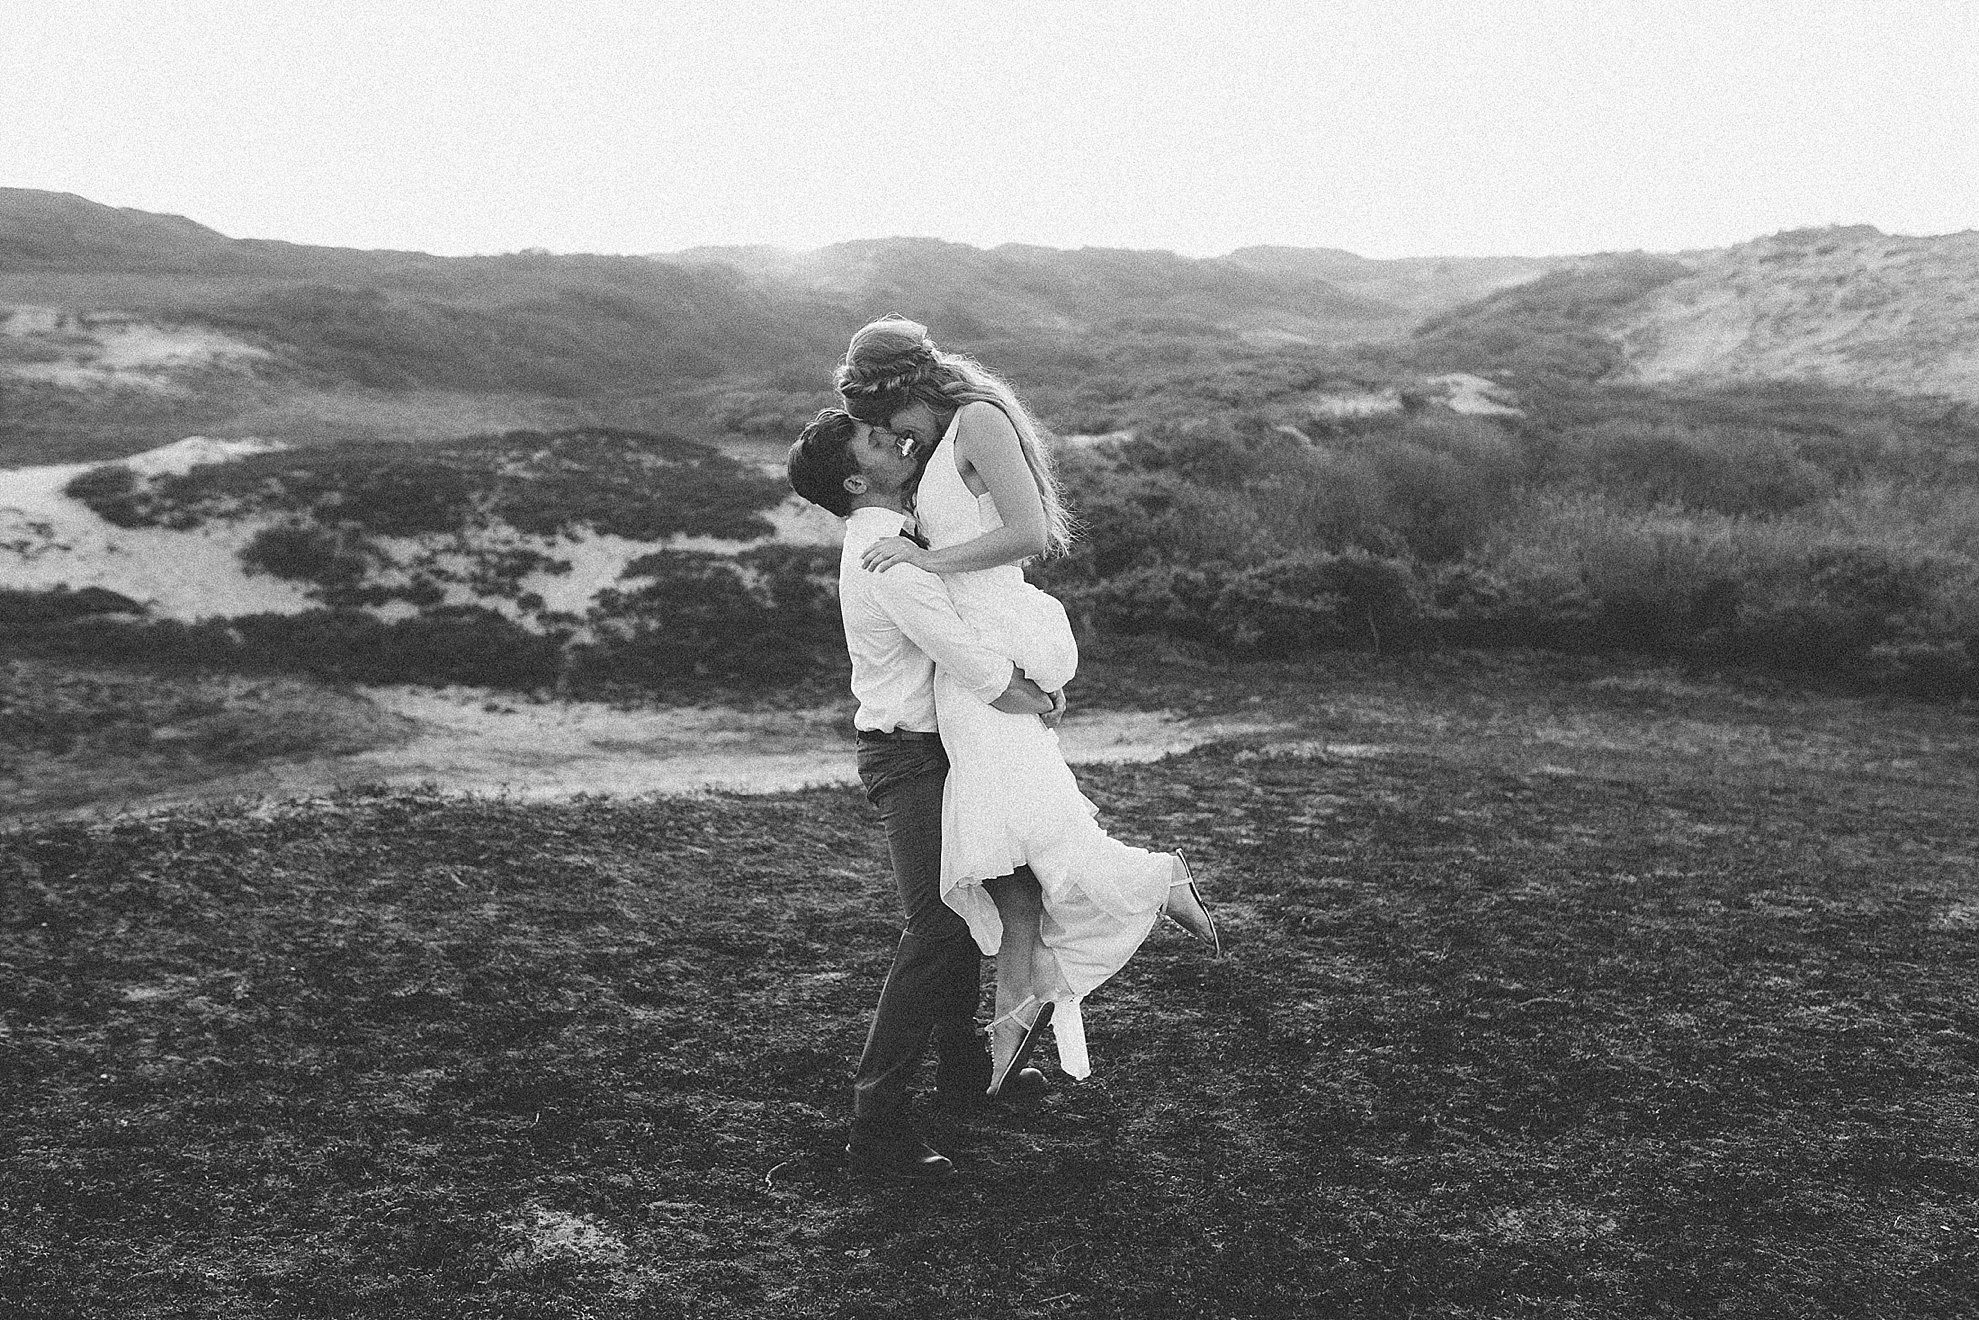 Vier-de-liefde-fotografie-Renkse-Meinema-fotografie_0021